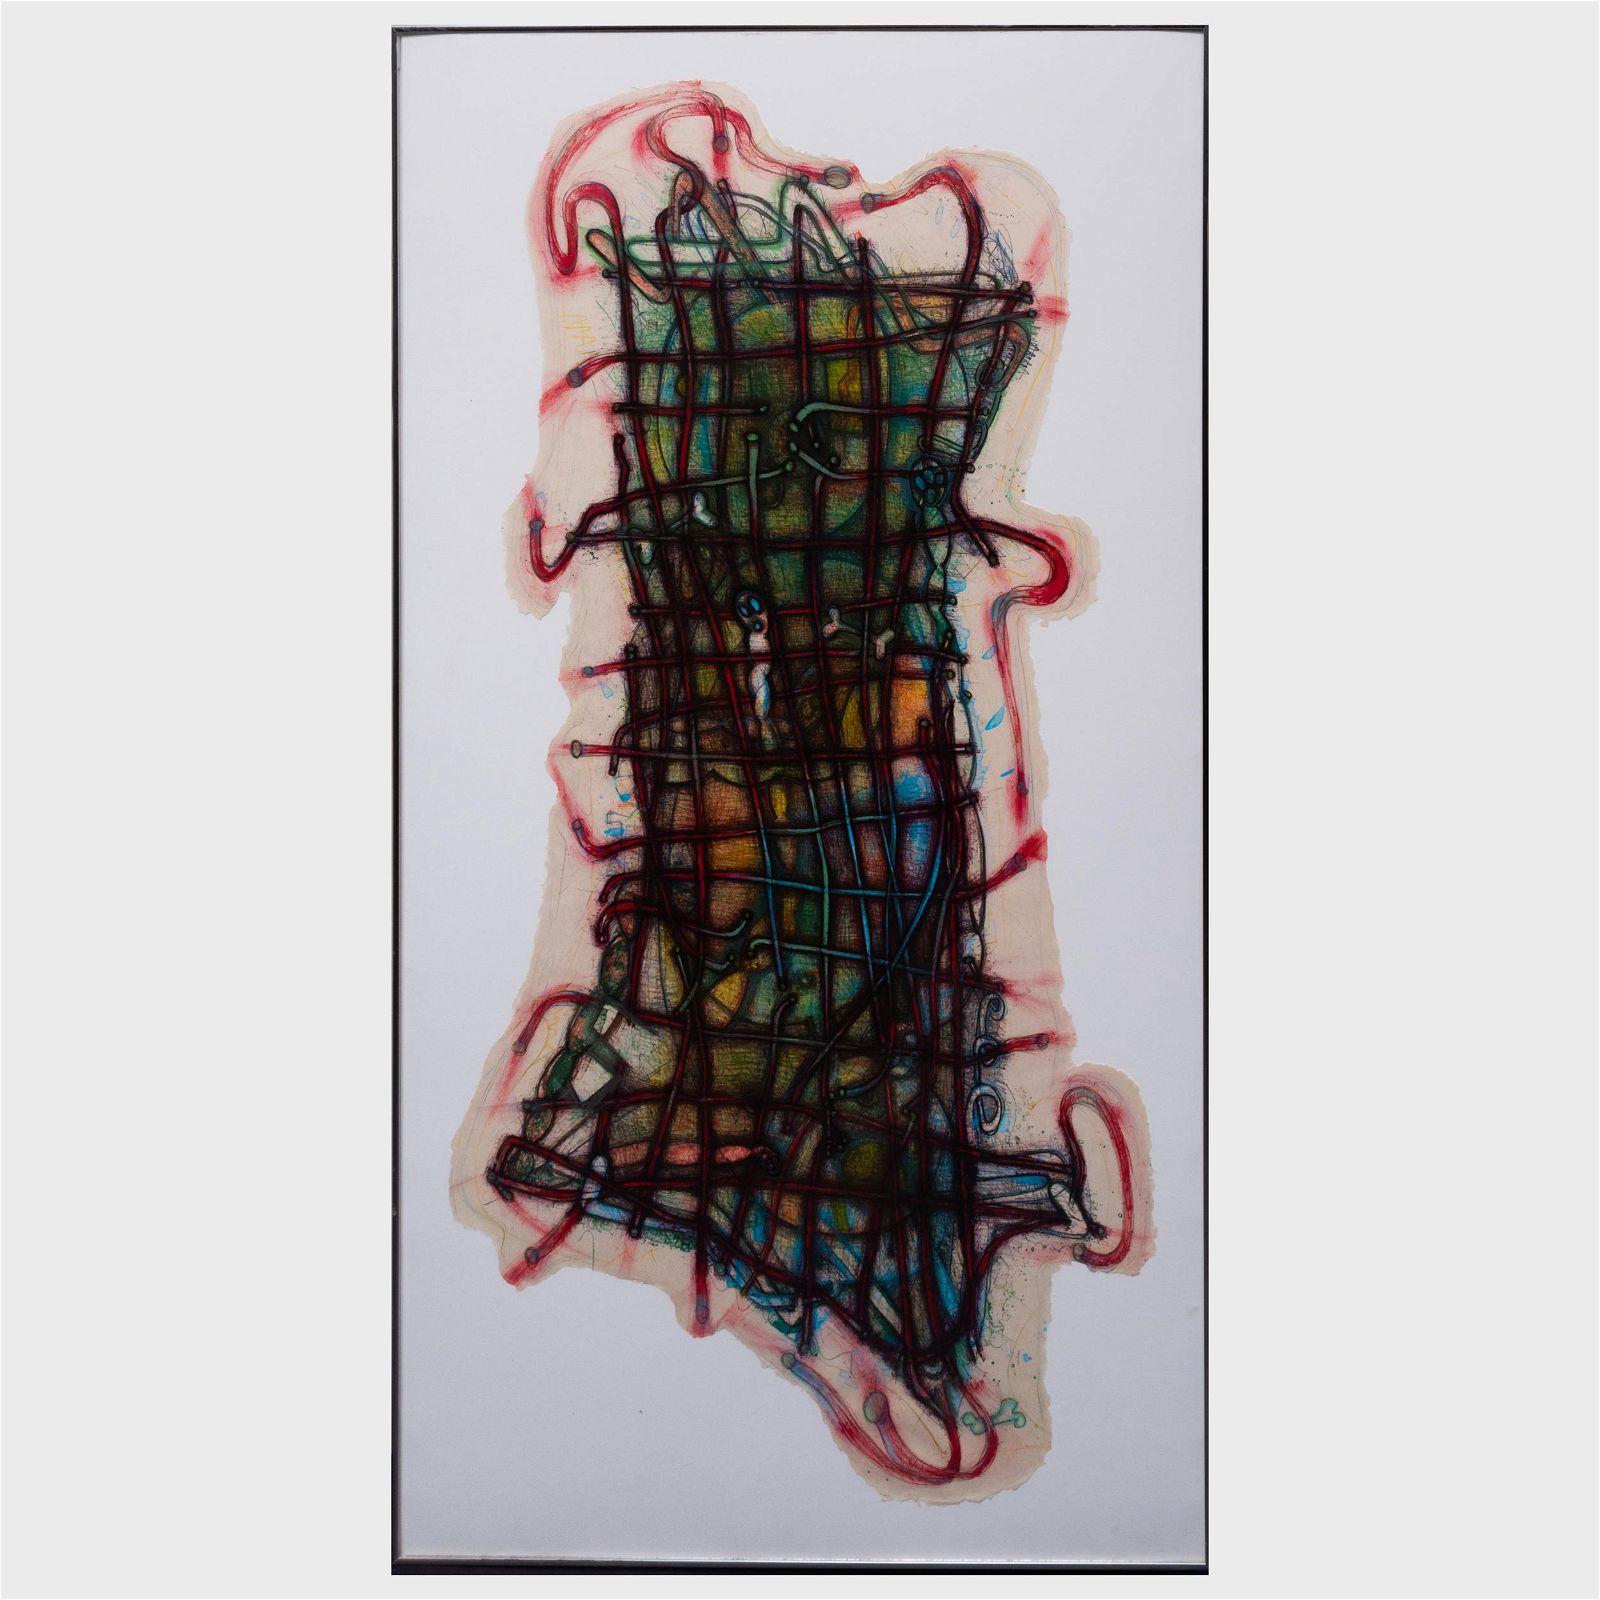 Elizabeth Murray (1940-2007): Wiggle Manhattan